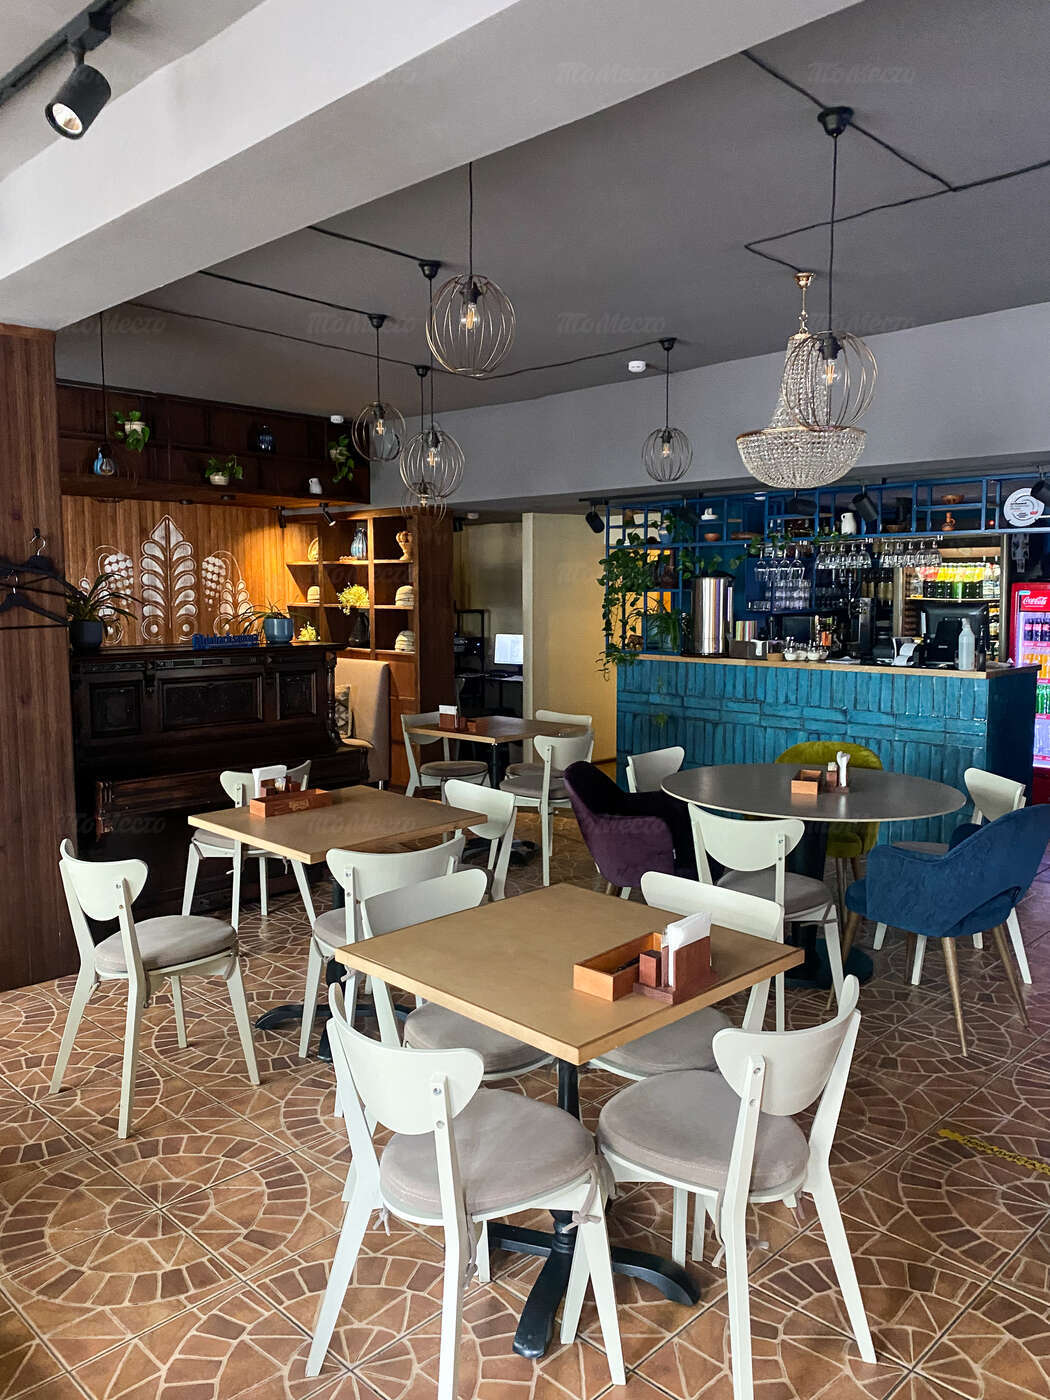 Банкеты кафе Хинкали & Хачапури на Ленина фото 9